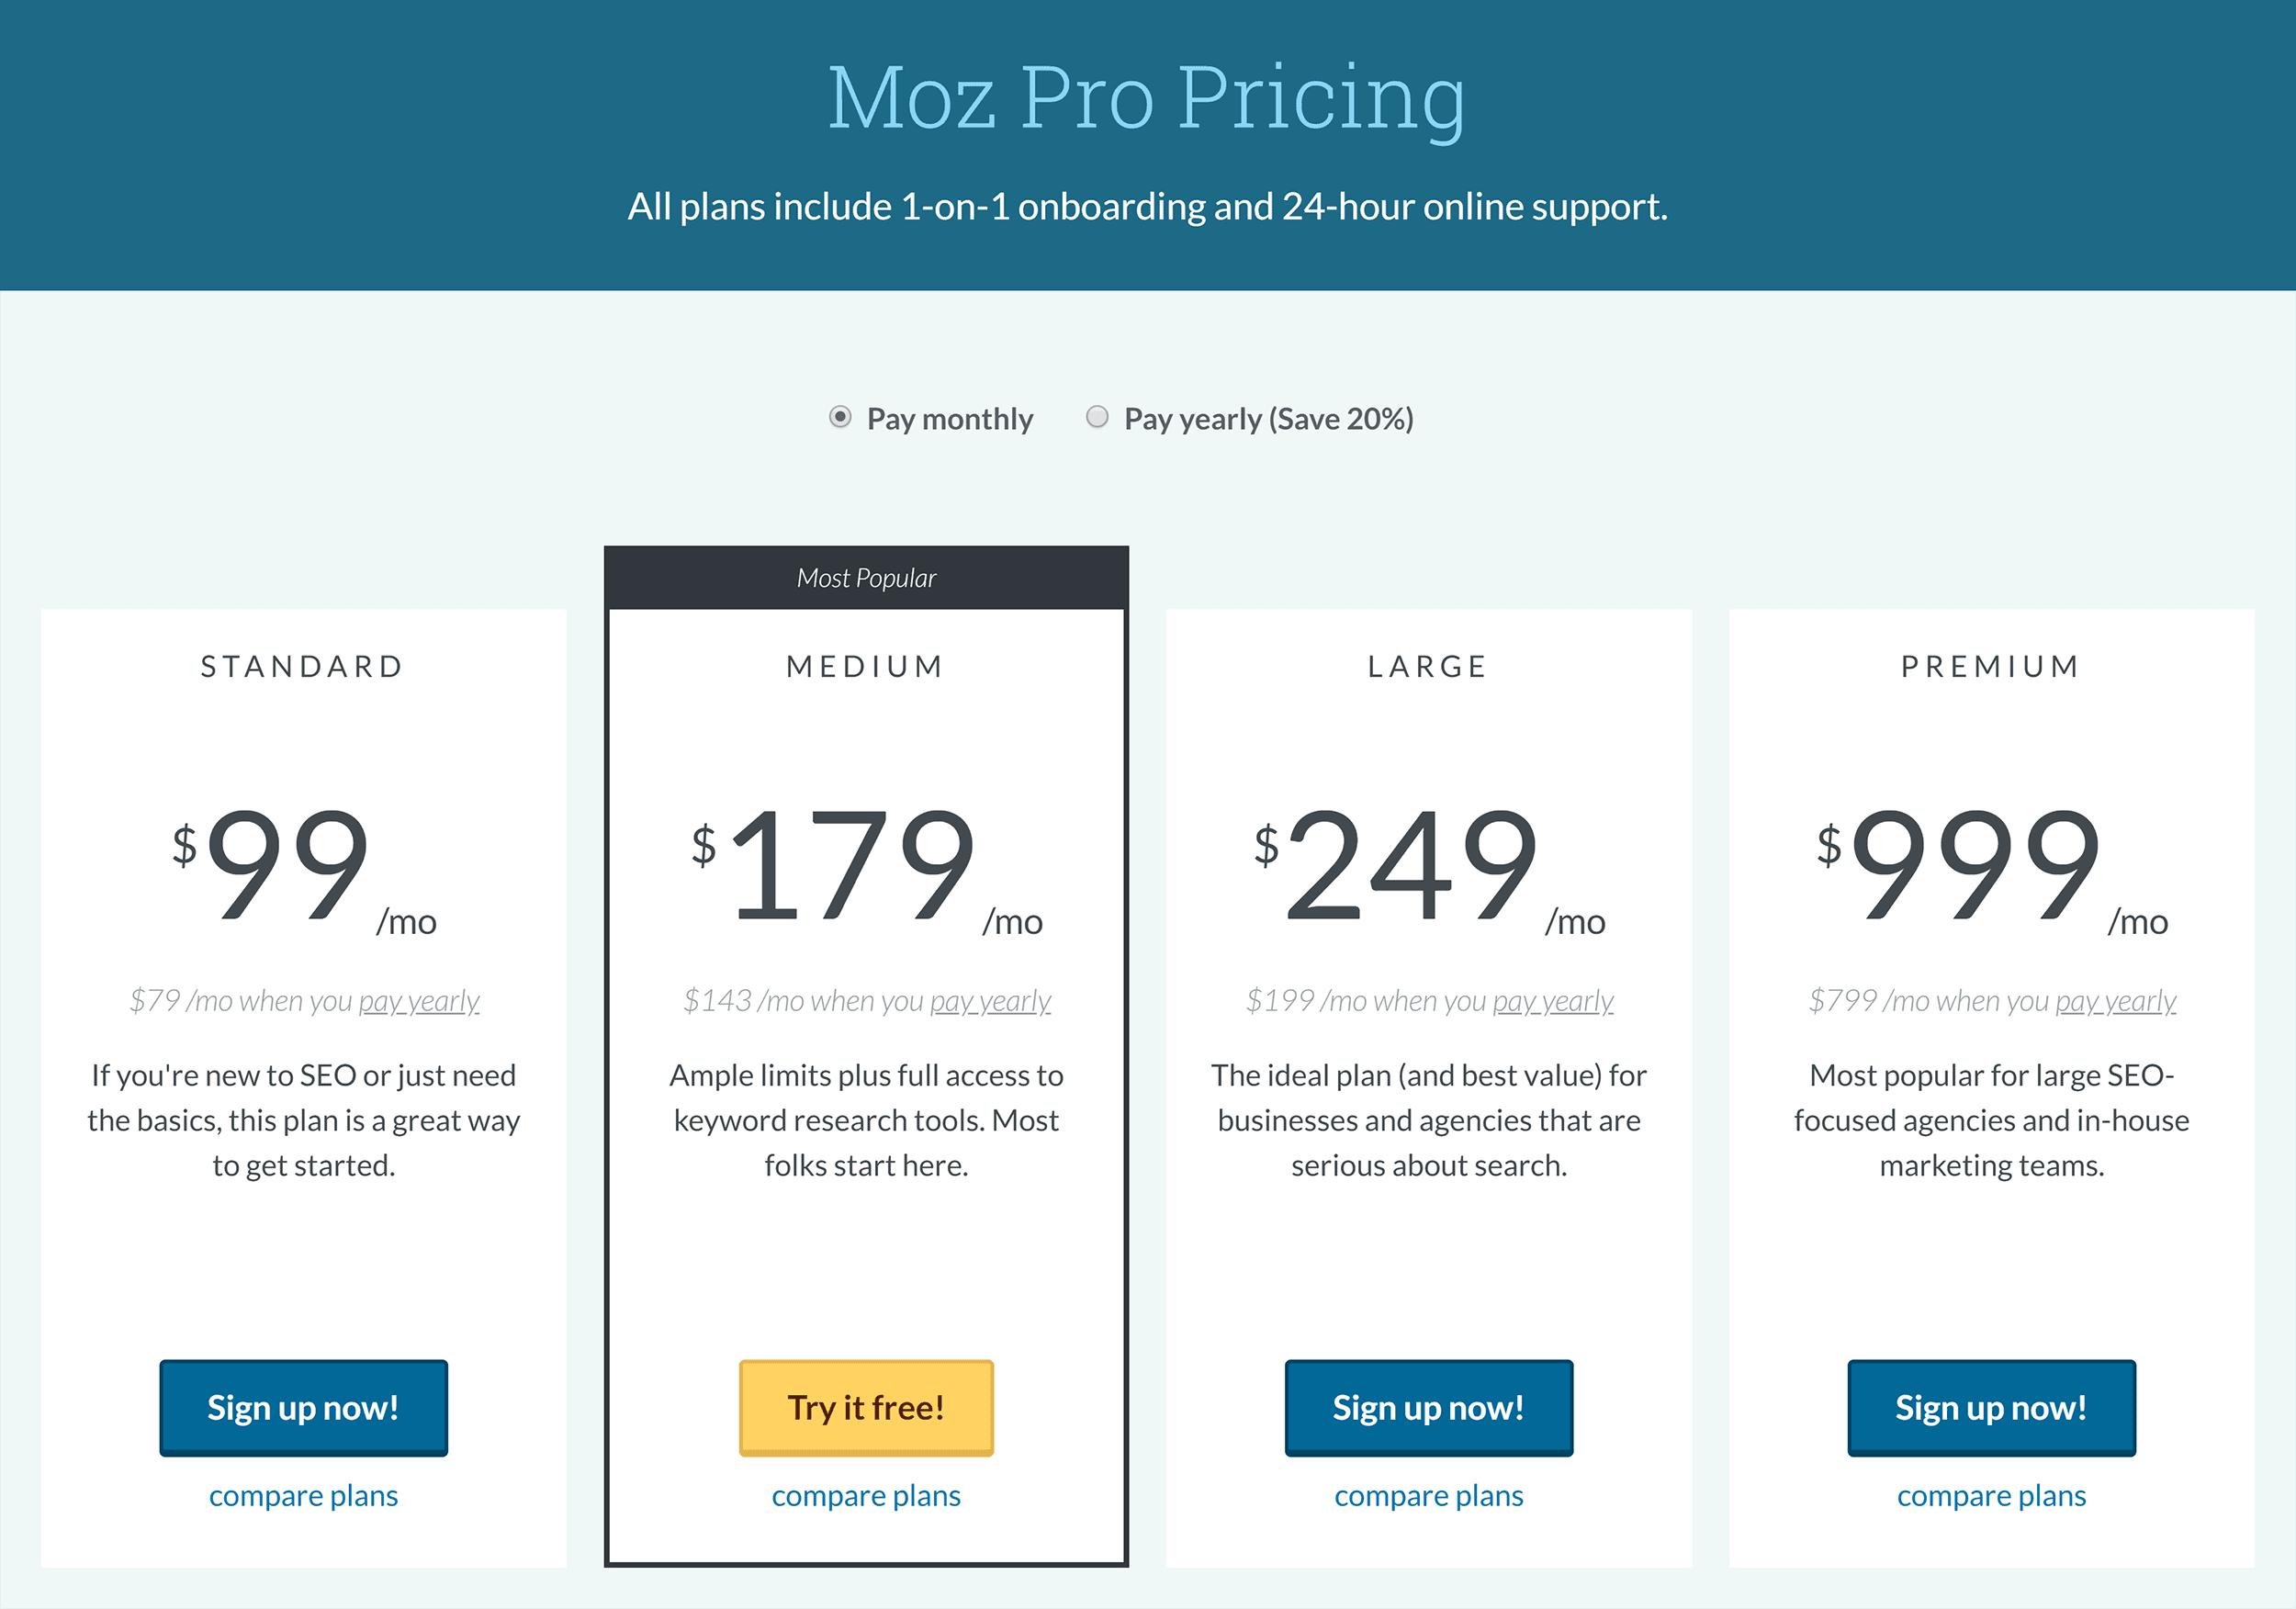 Moz Pro – Pricing